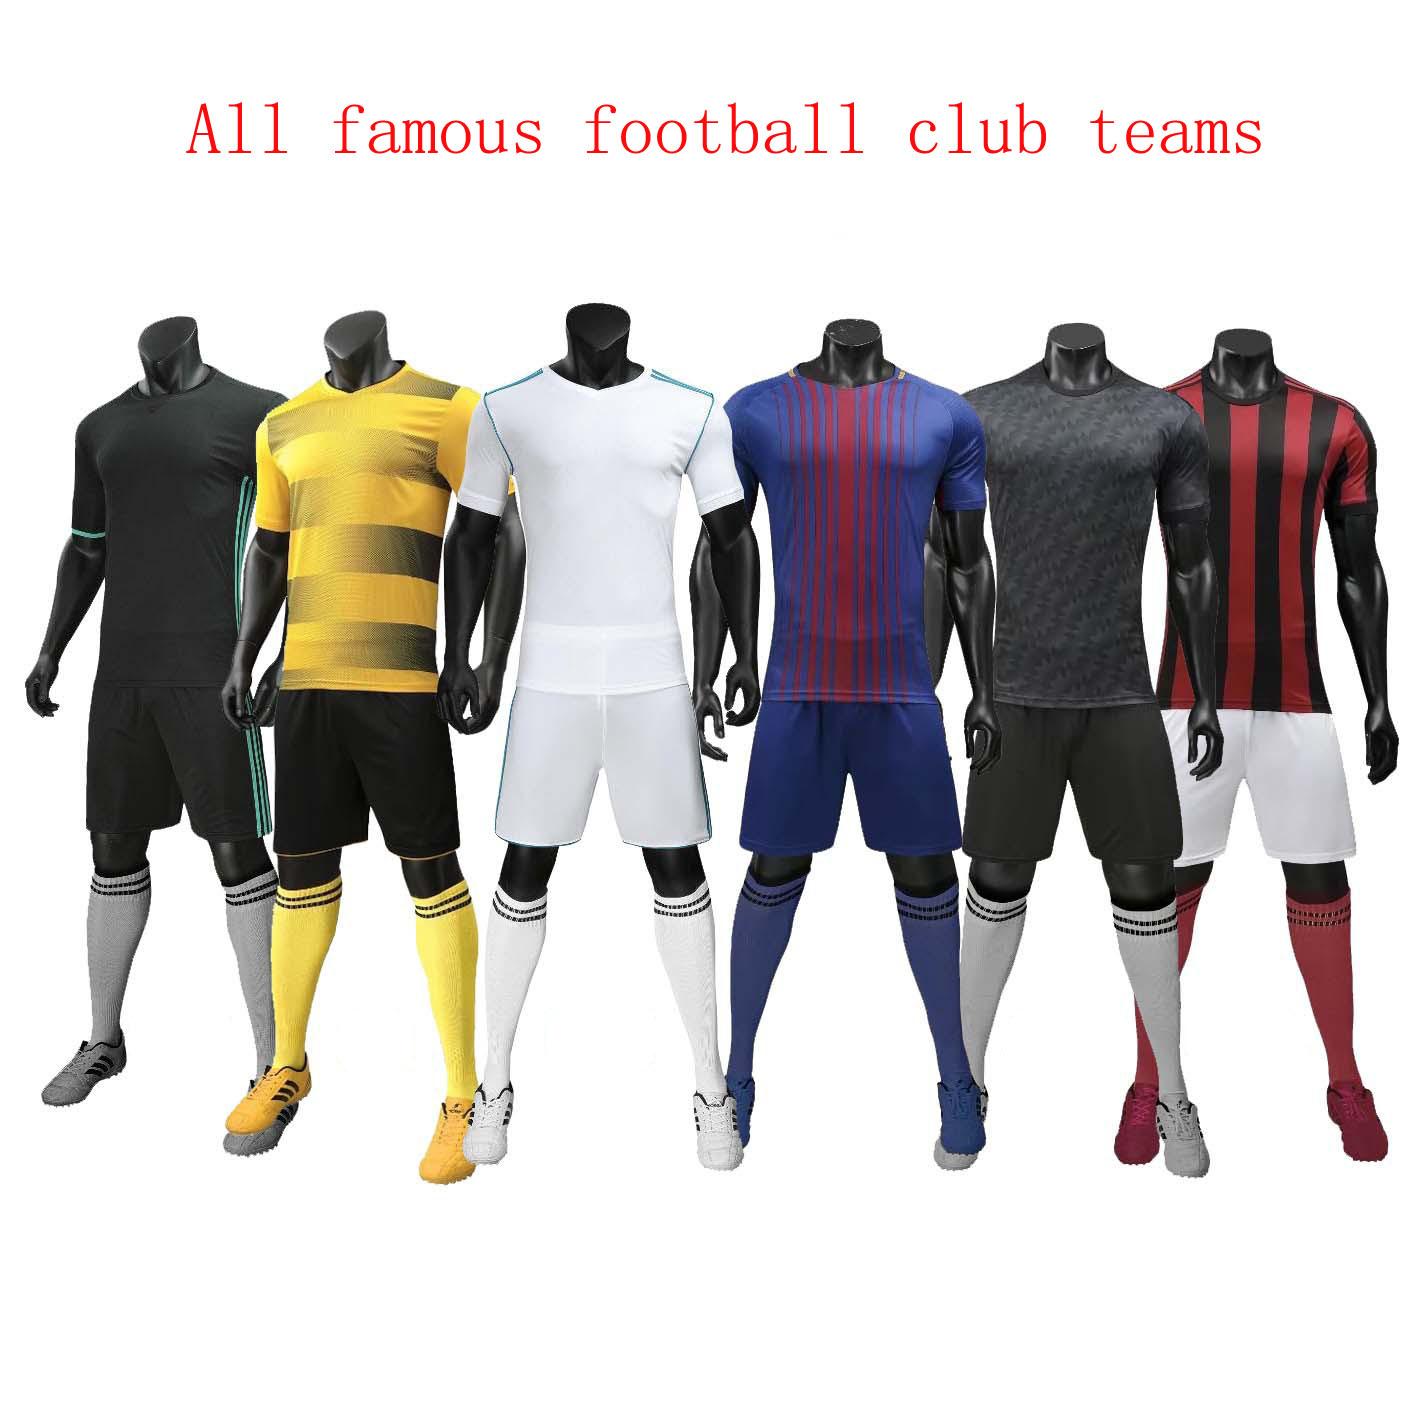 Baru Murah Semua Tim Sepak Bola Terkenal Football Club Jersey Buy Football Club Jersey Tim Sepak Bola Jersey Jersey Bola Product On Alibaba Com